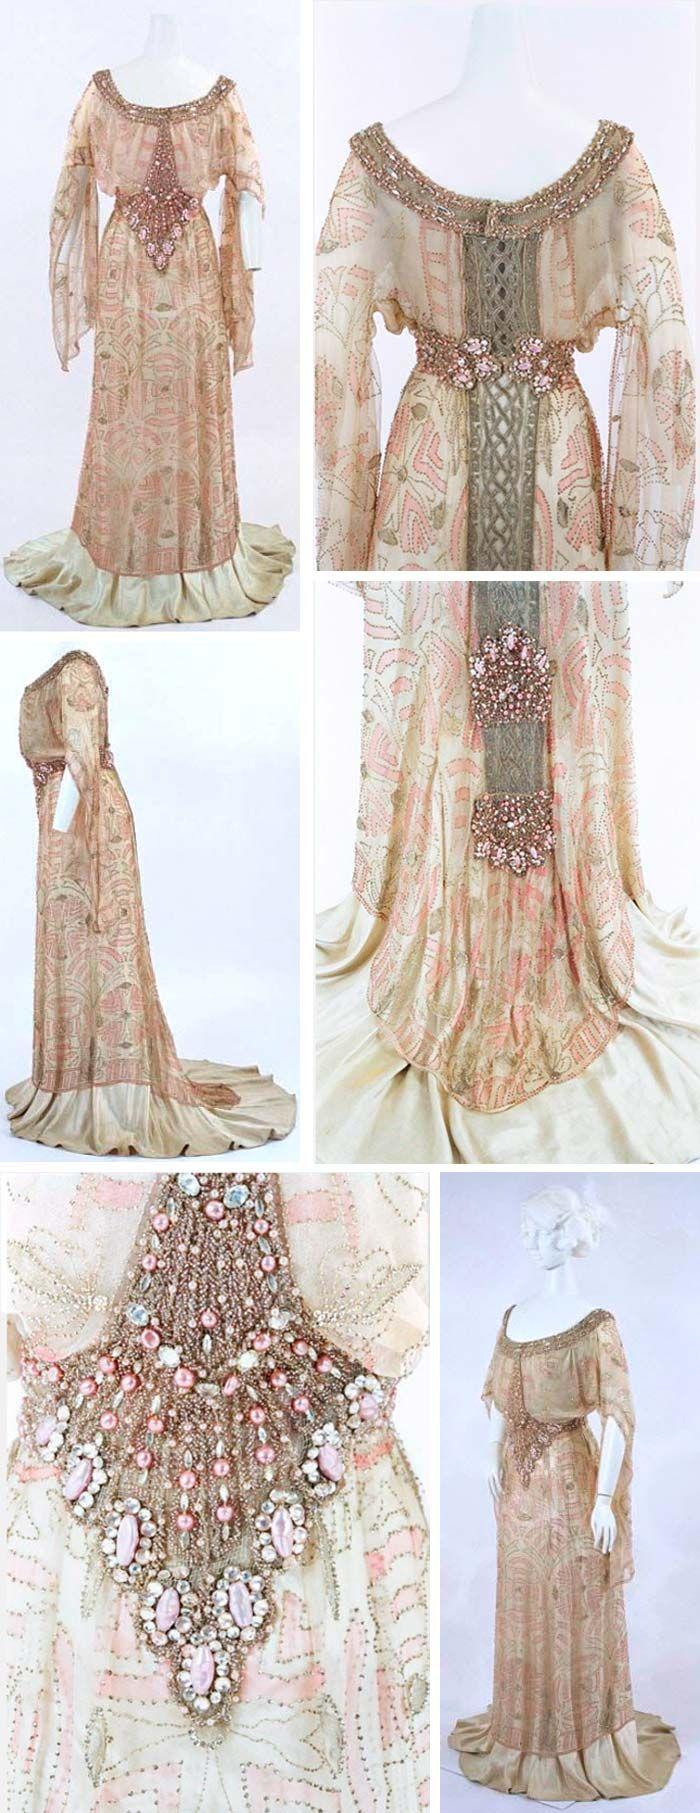 "Evening dress, Jacques Doucet, ca. 1910. Silk satin & chiffon, beads, faux pearls, rhinestones. ""Pouter pigeon"" bodice creating ""S"" shape. Bunka Gakuen Costume Museum, Tokyo"